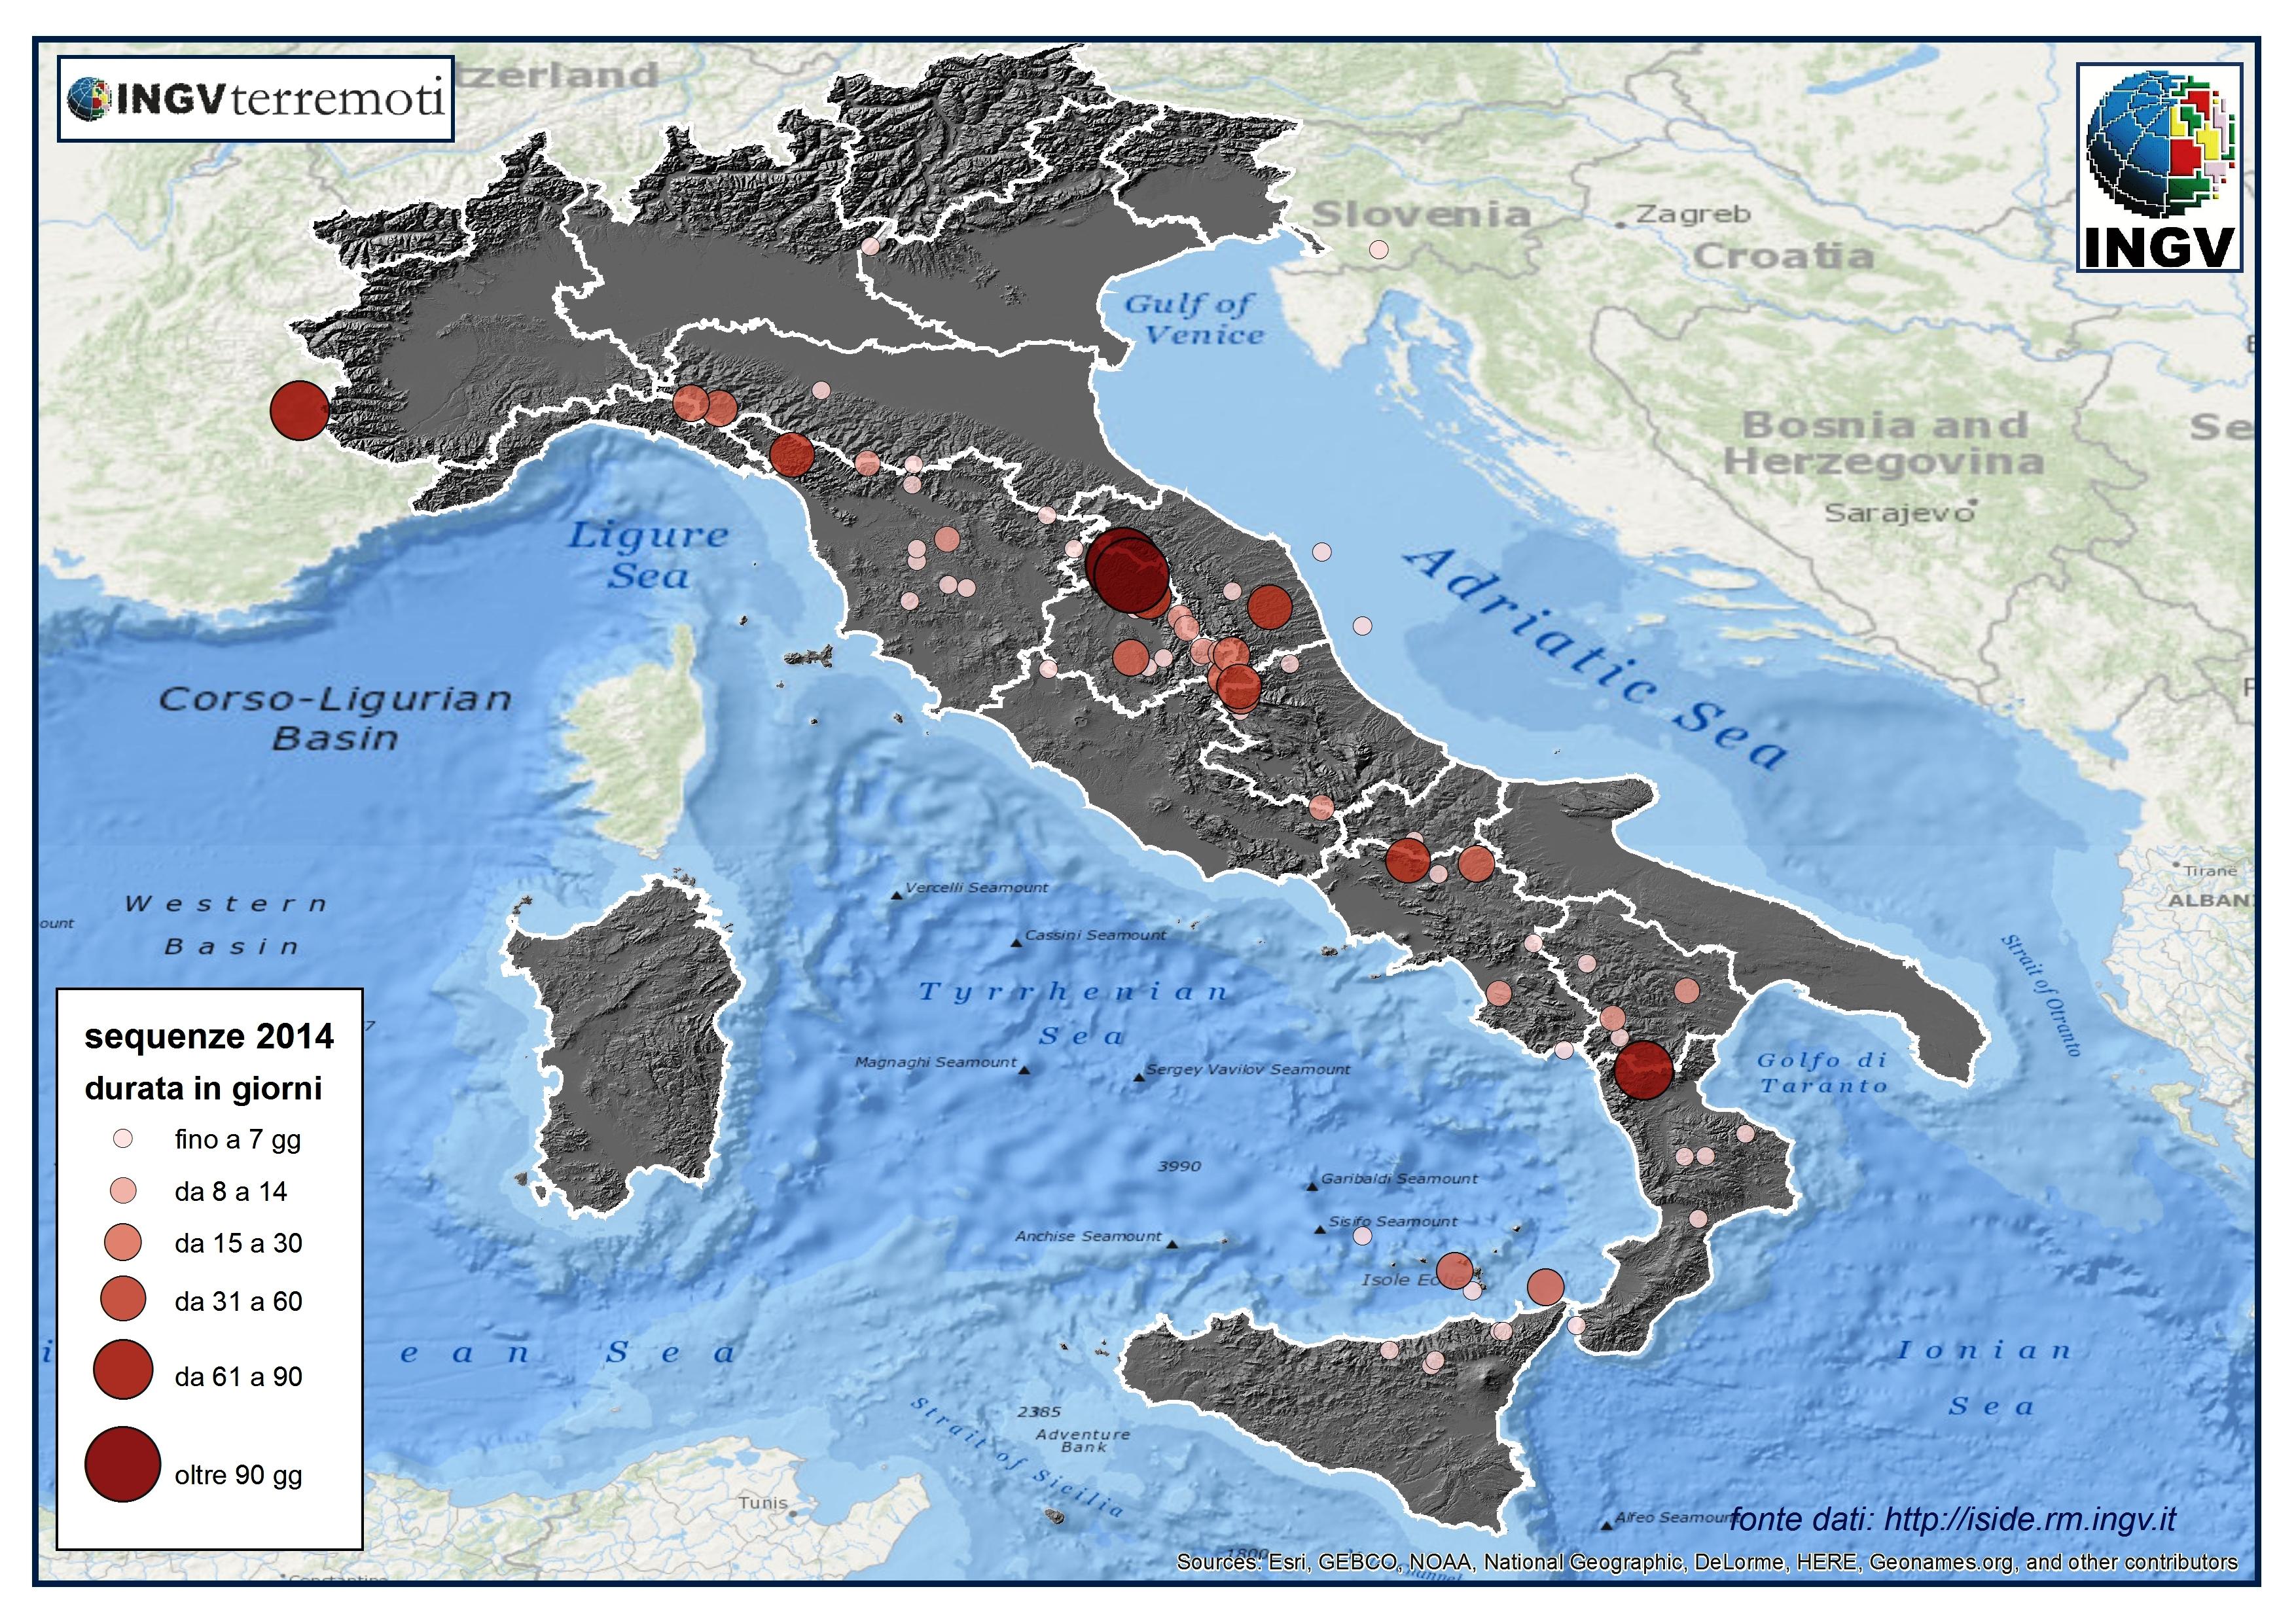 Cartina Italia Terremoti.6aprile Itspeciale Ingv Italia Sismica I Terremoti Del 2014 6aprile It